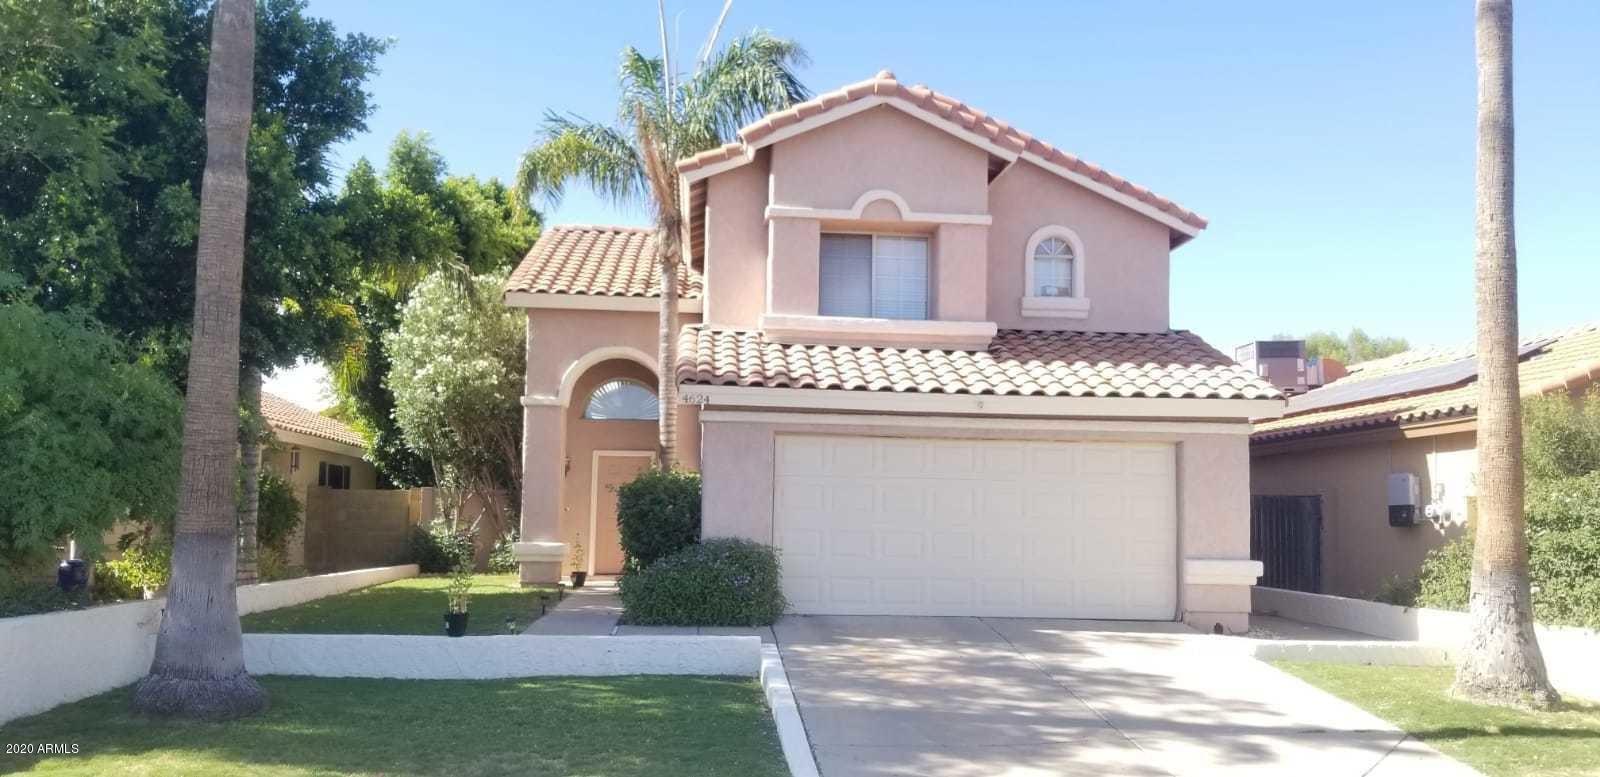 Property Image Of 4624 E Saint John Road In Phoenix, Az